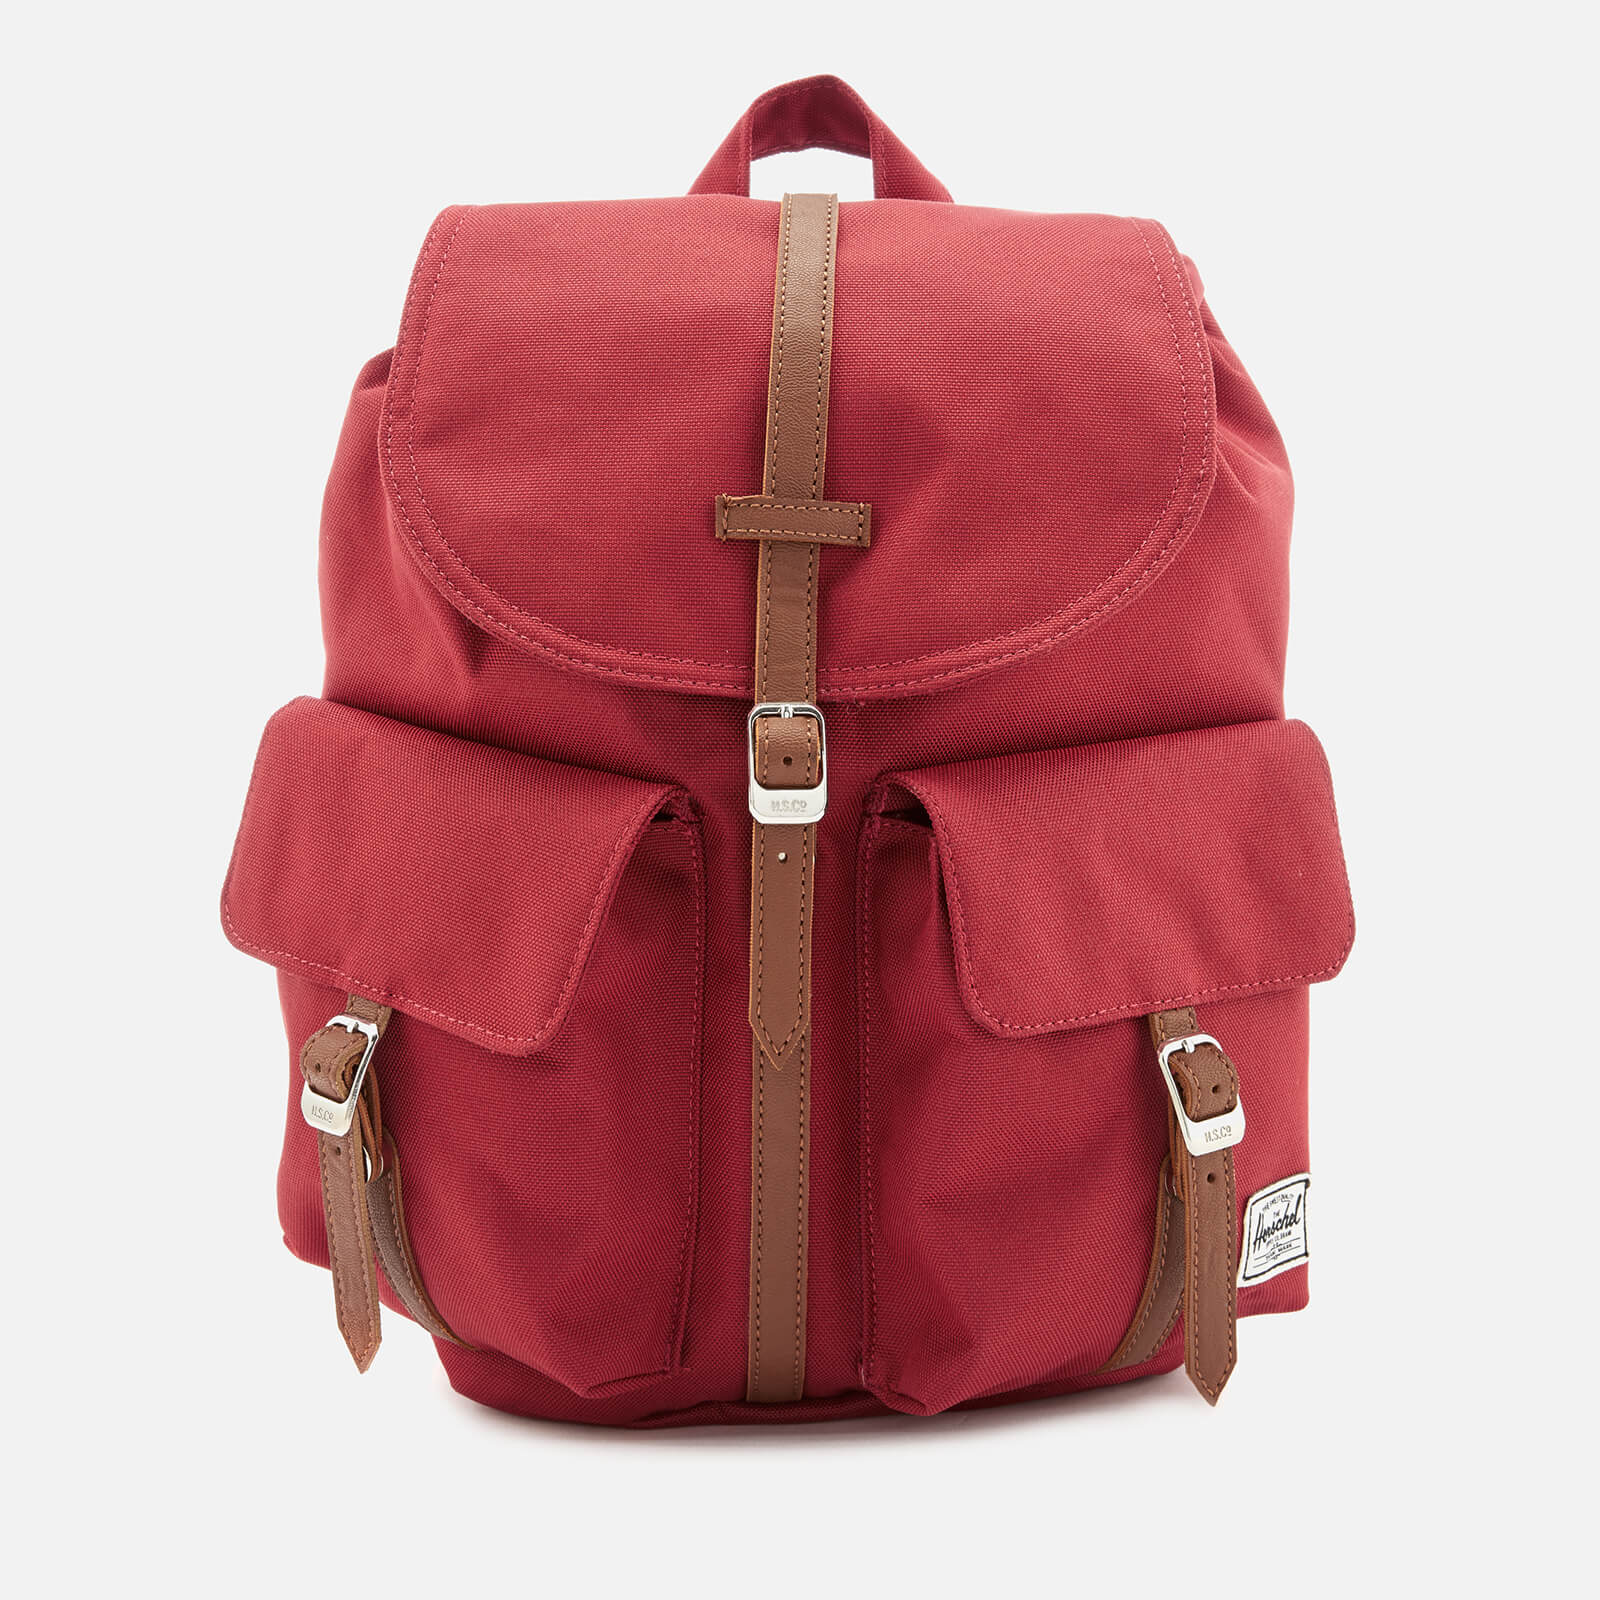 3fef9002b85 ... Herschel Supply Co. Women s Dawson Extra Small Backpack - Brick Red Tan